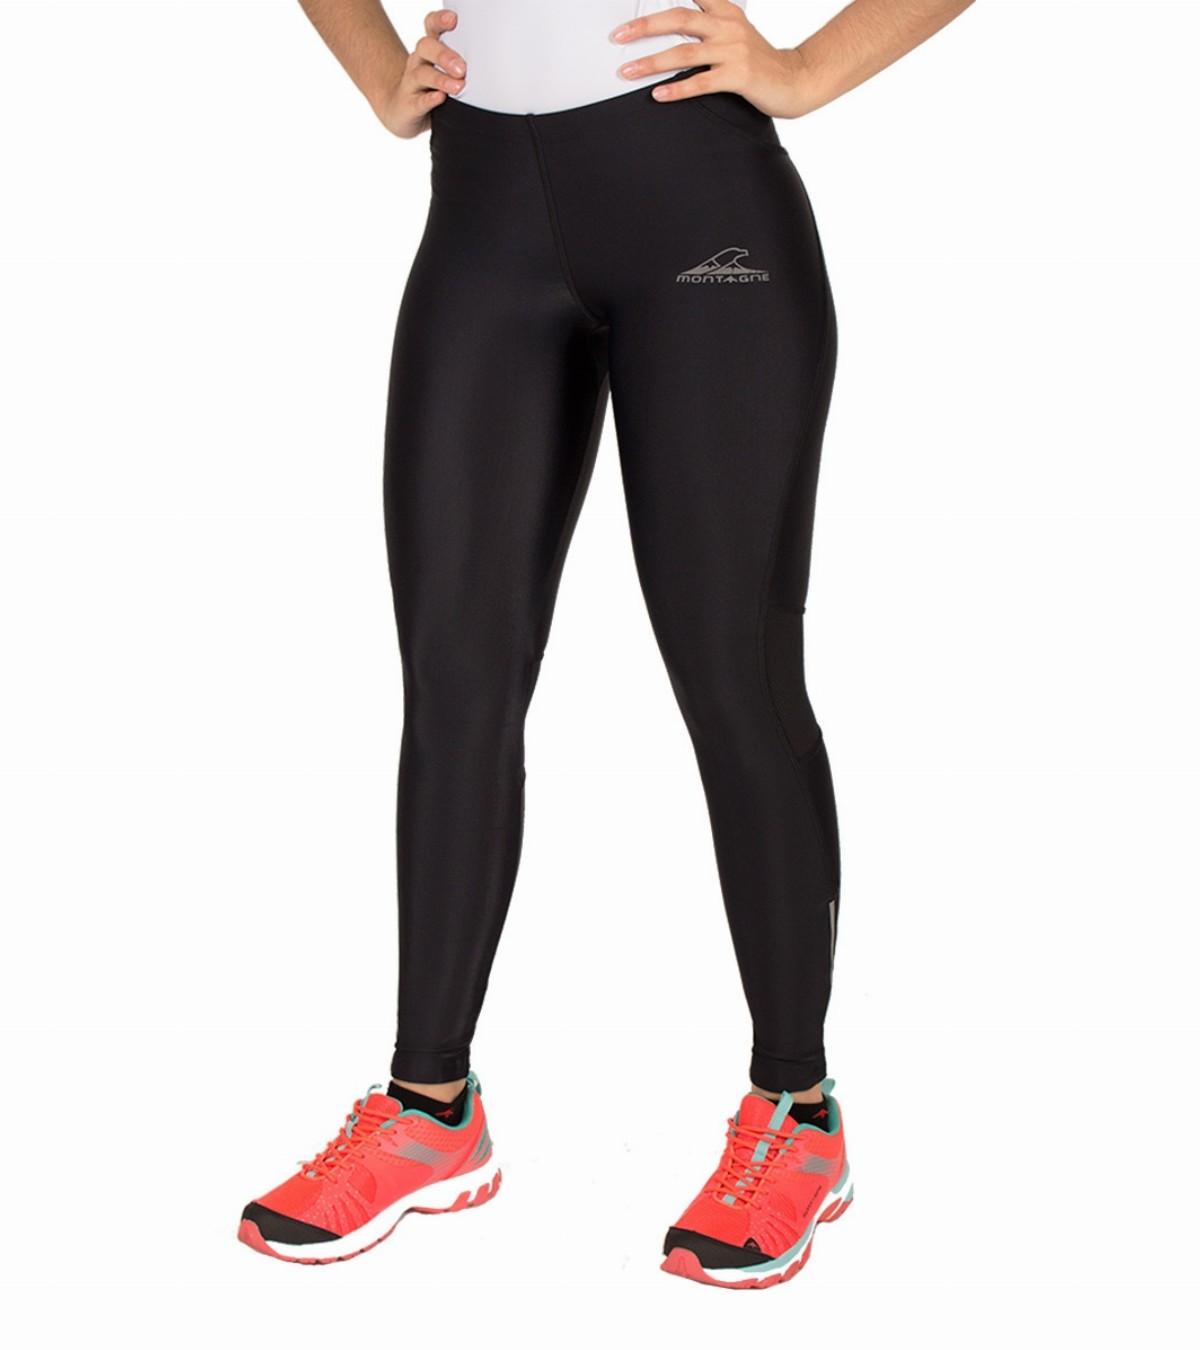 d68188f89 Montagne: calzas, calza, pantalon calza, calza de, calza deportiva ...